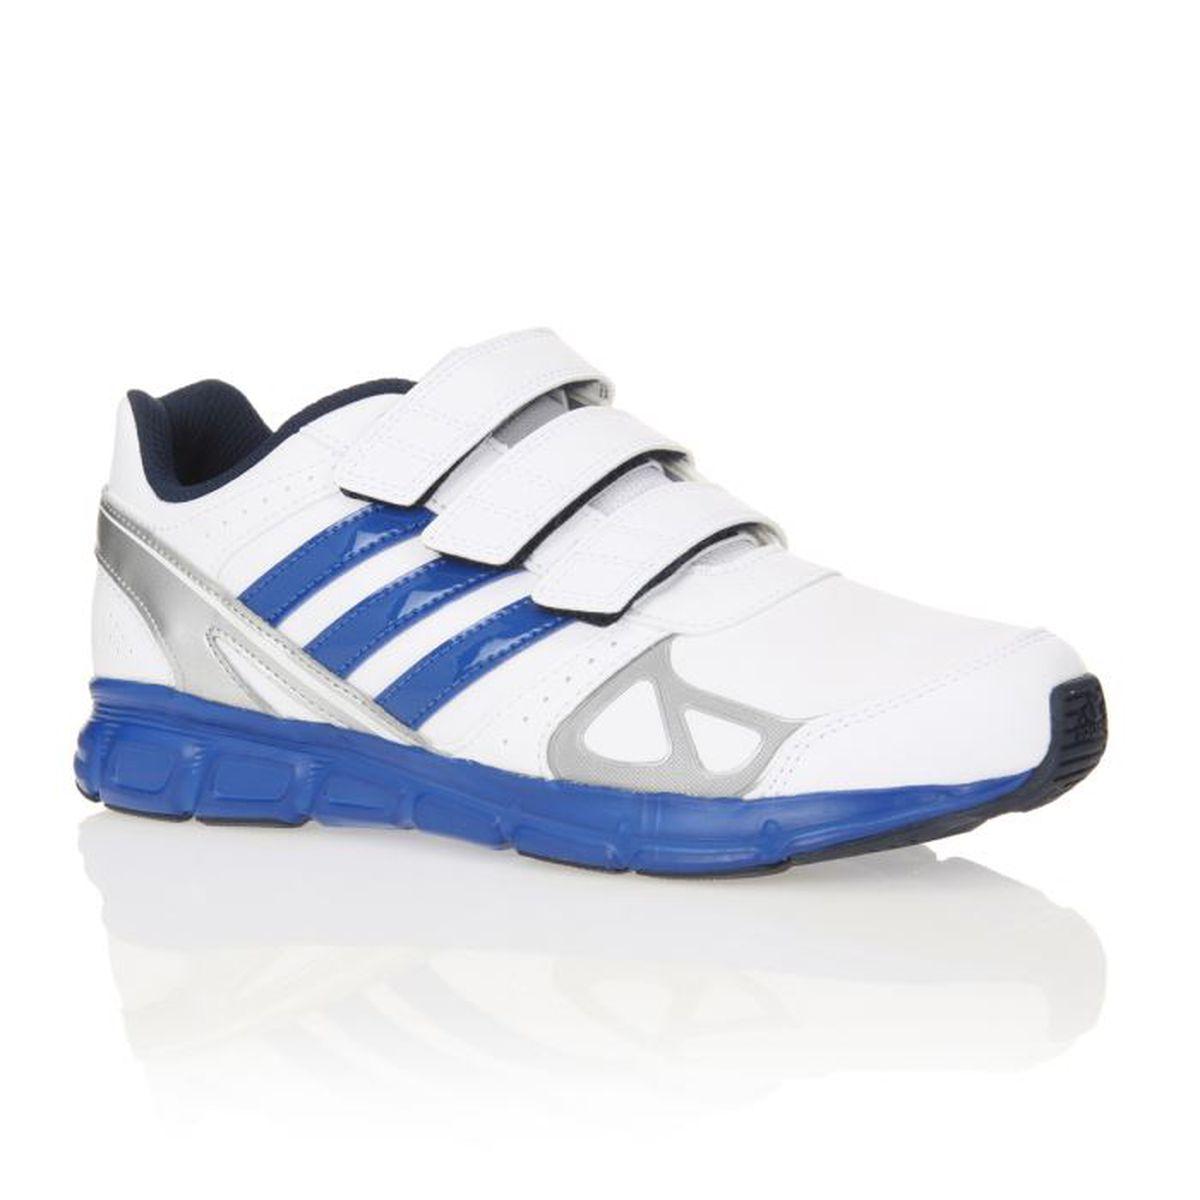 Chaussures Homme Adidas chaussure Liquidation Multisport Furano hdrCtxsQ